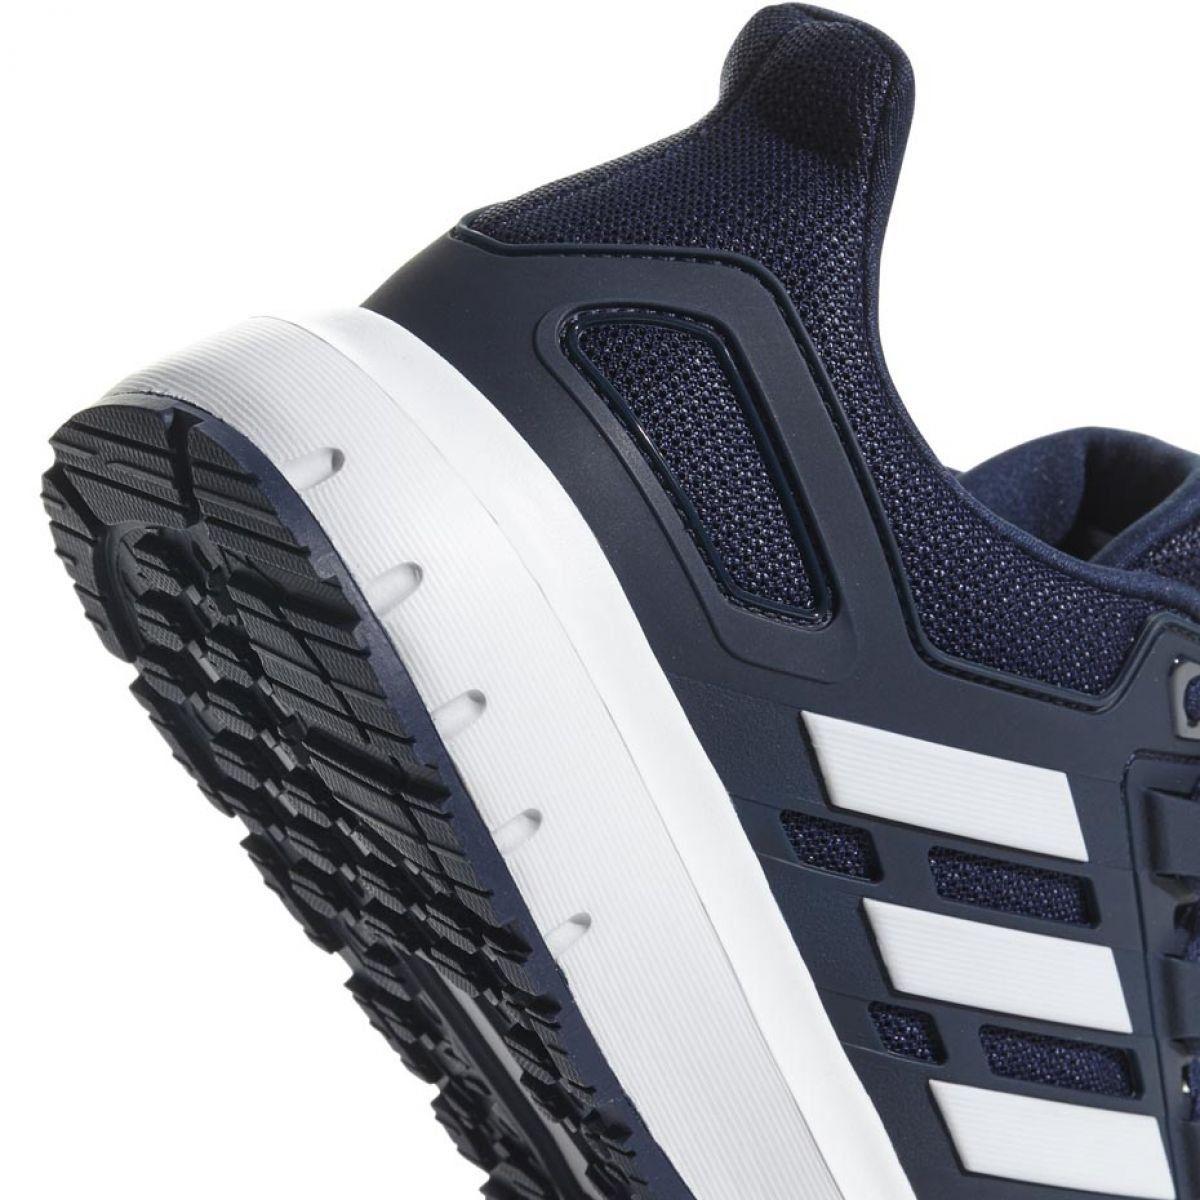 Buty Biegowe Adidas Energy Cloud 2 M Cp9769 Granatowe Adidas Running Shoes Running Shoes Adidas